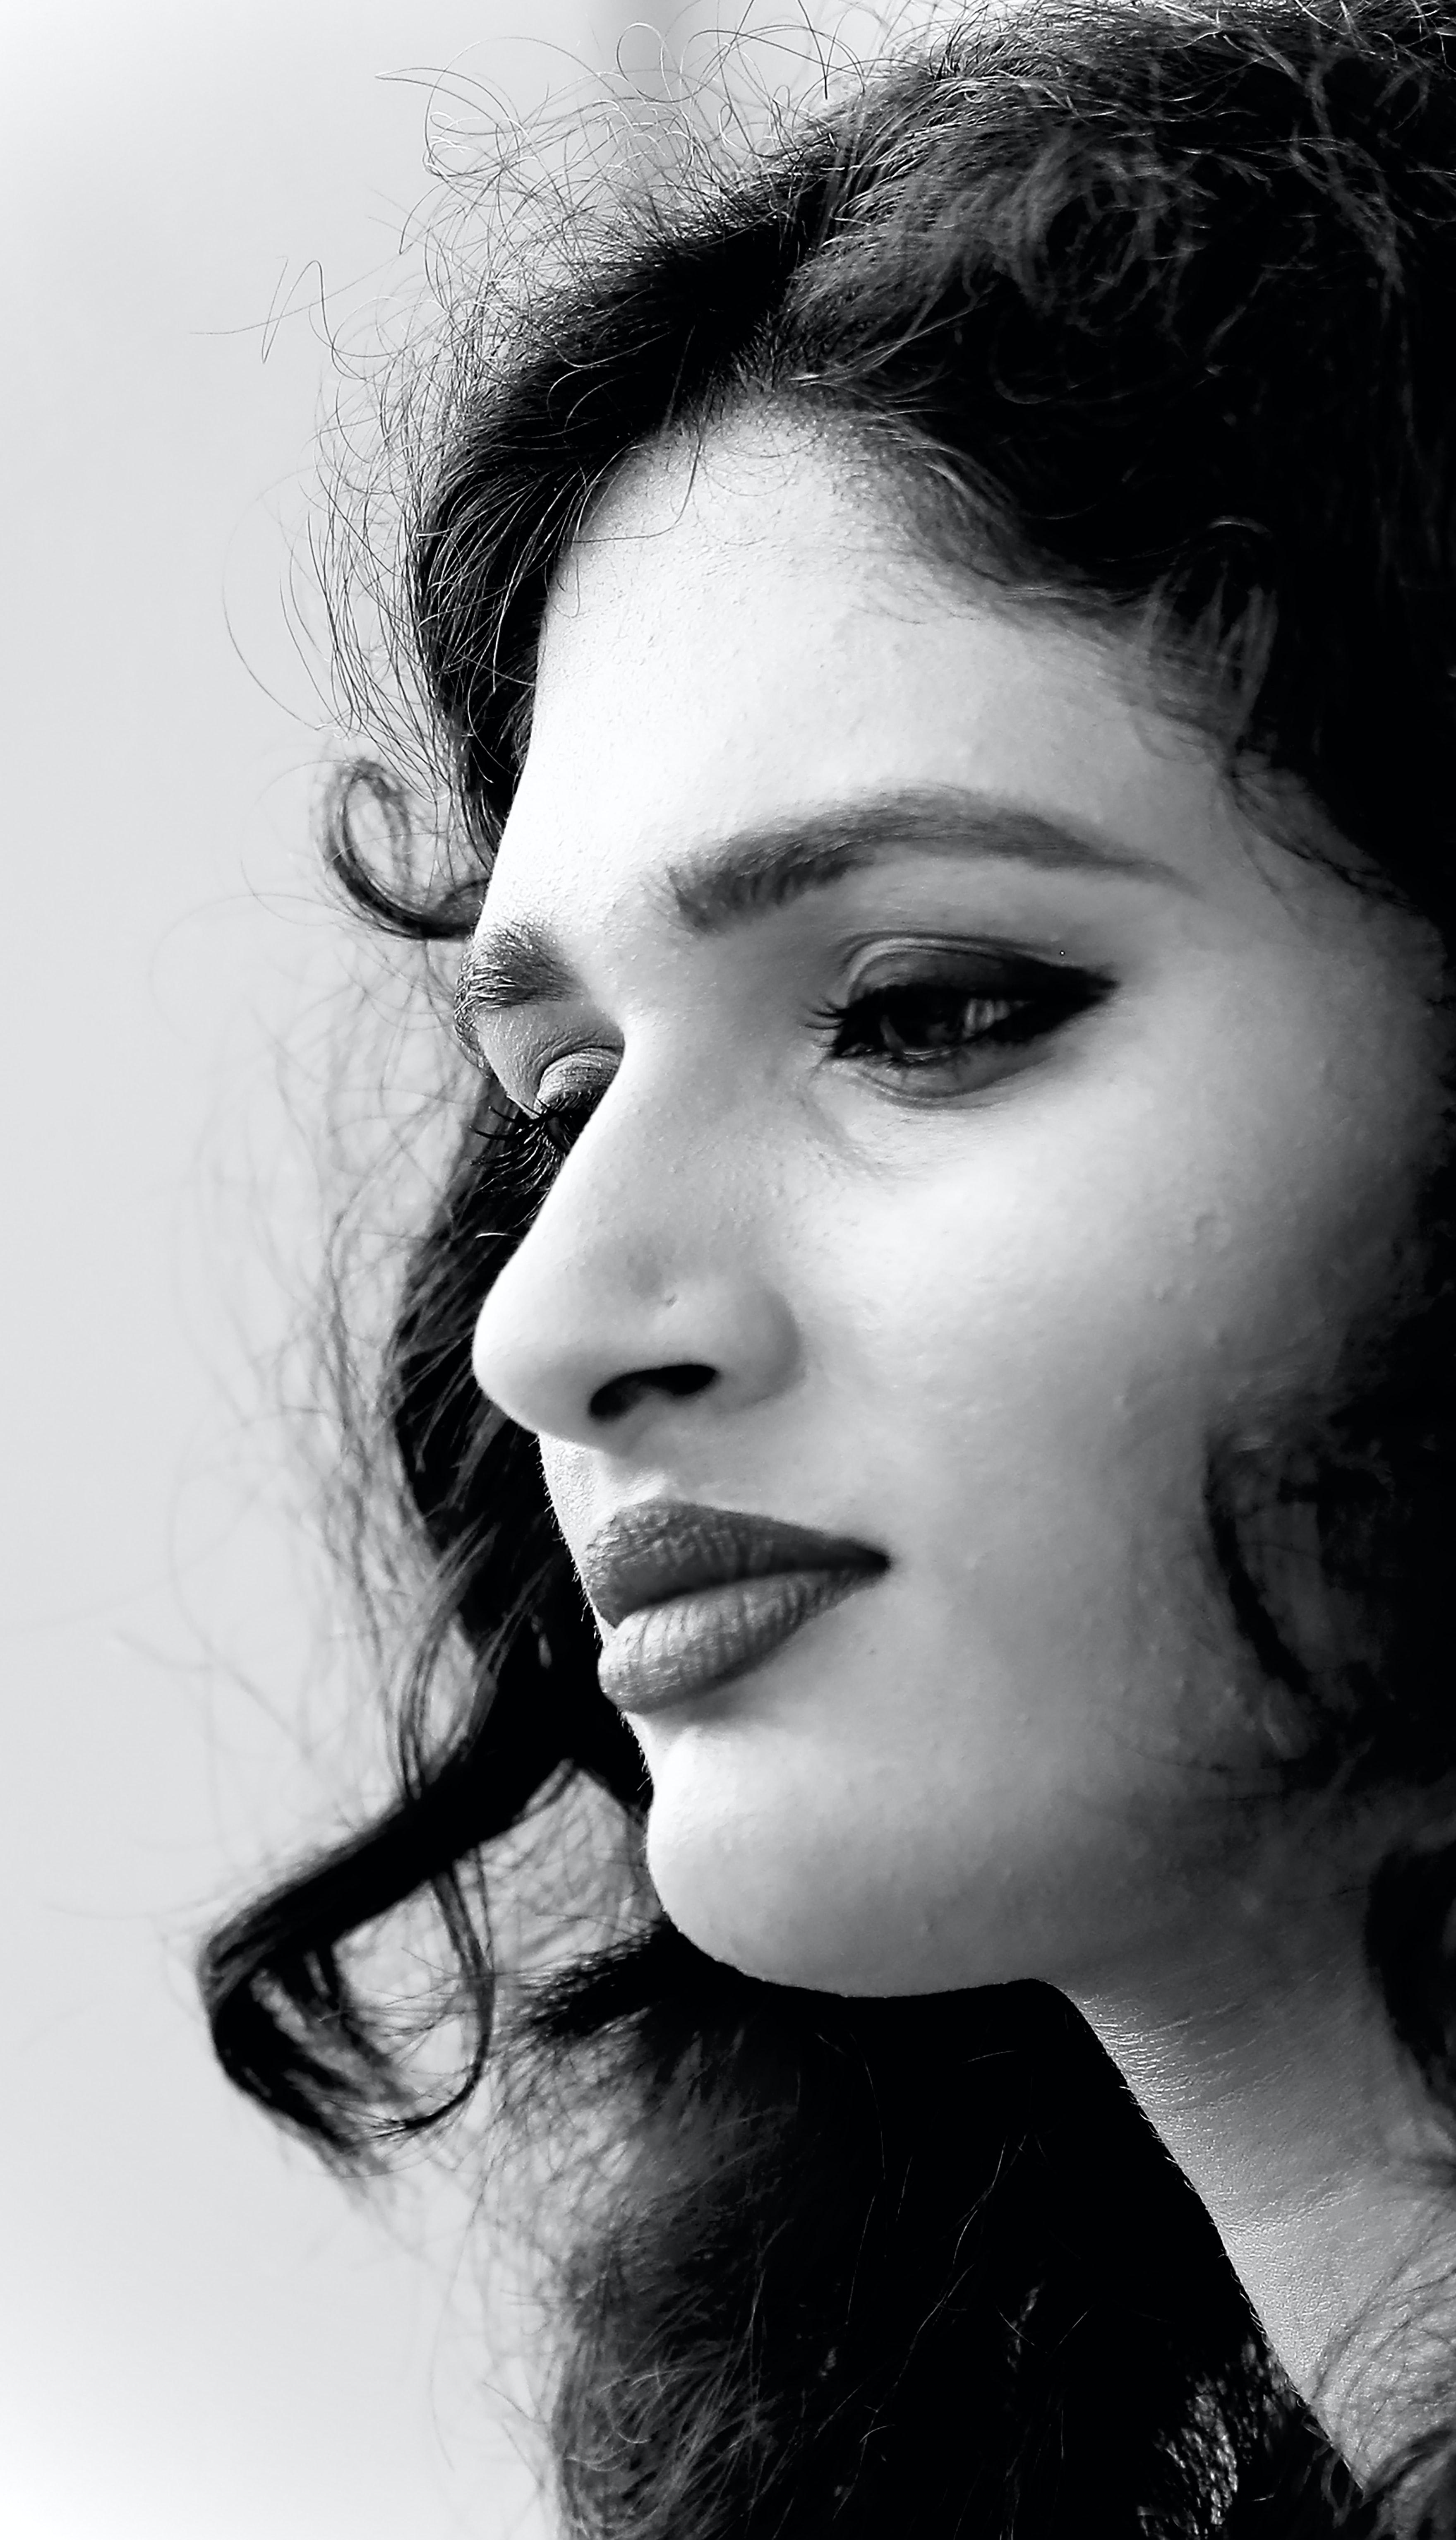 Greyscale Photography Of Woman Photo Free Face Image On Unsplash